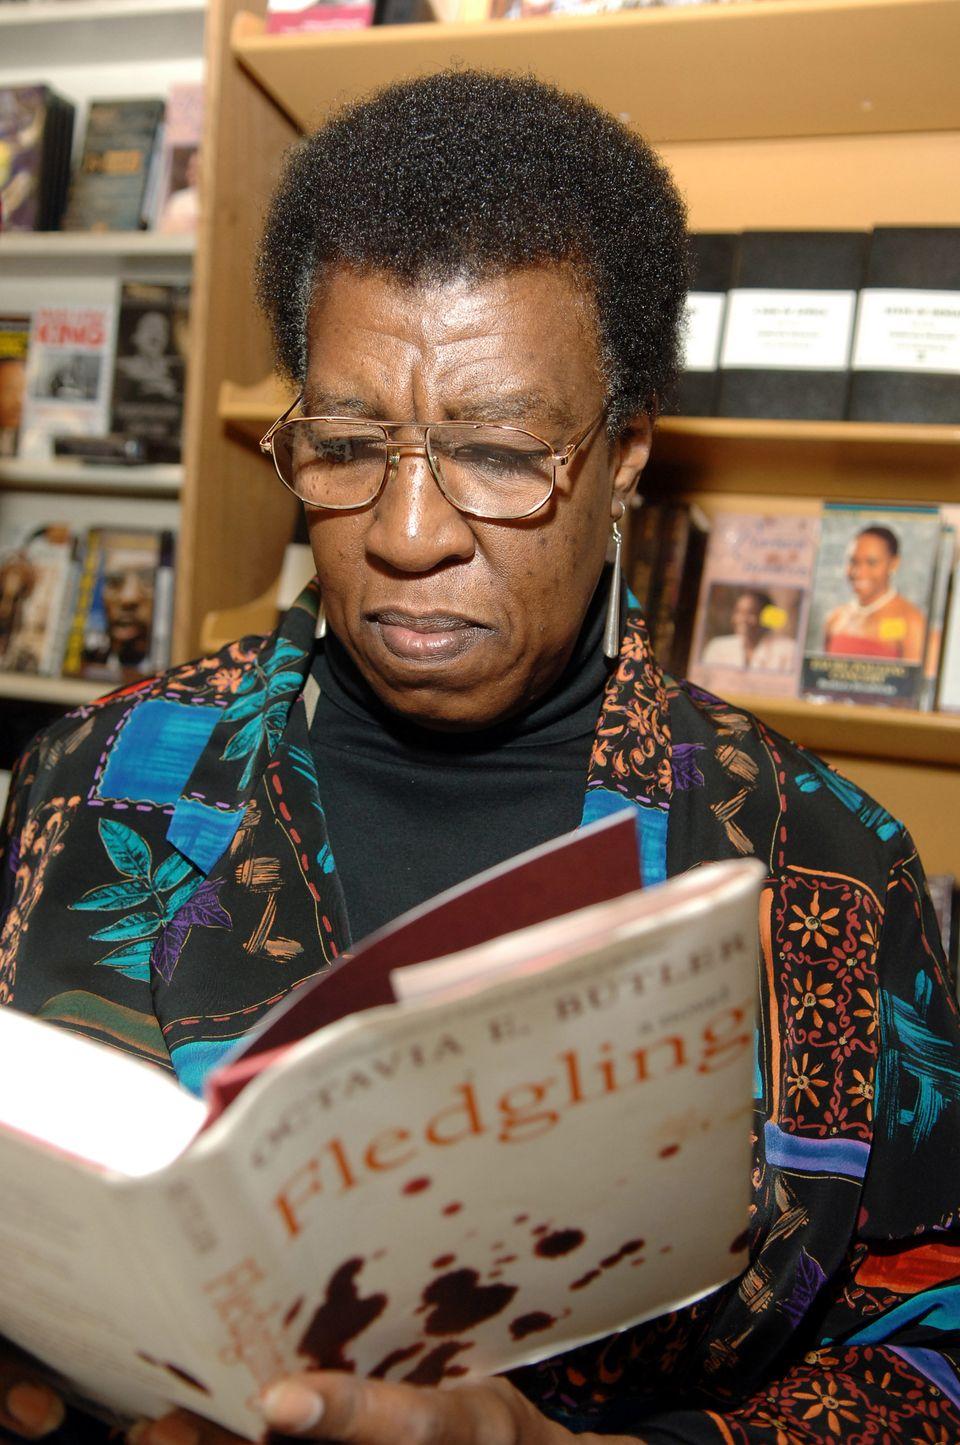 American sci-fi writer Octavia E. Butler